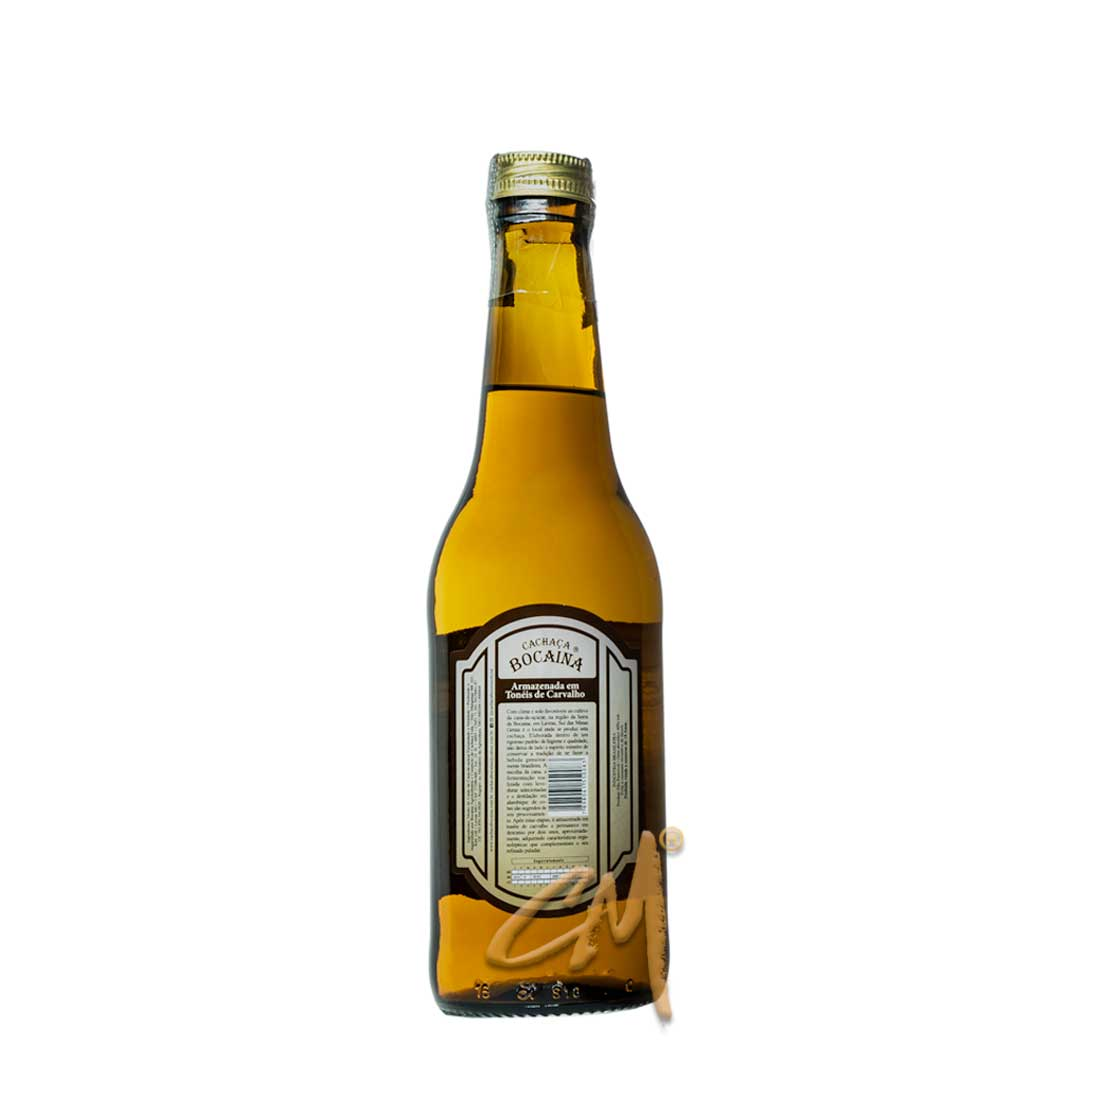 Cachaça Bocaina Carvalho 300 ml (Lavras - MG)